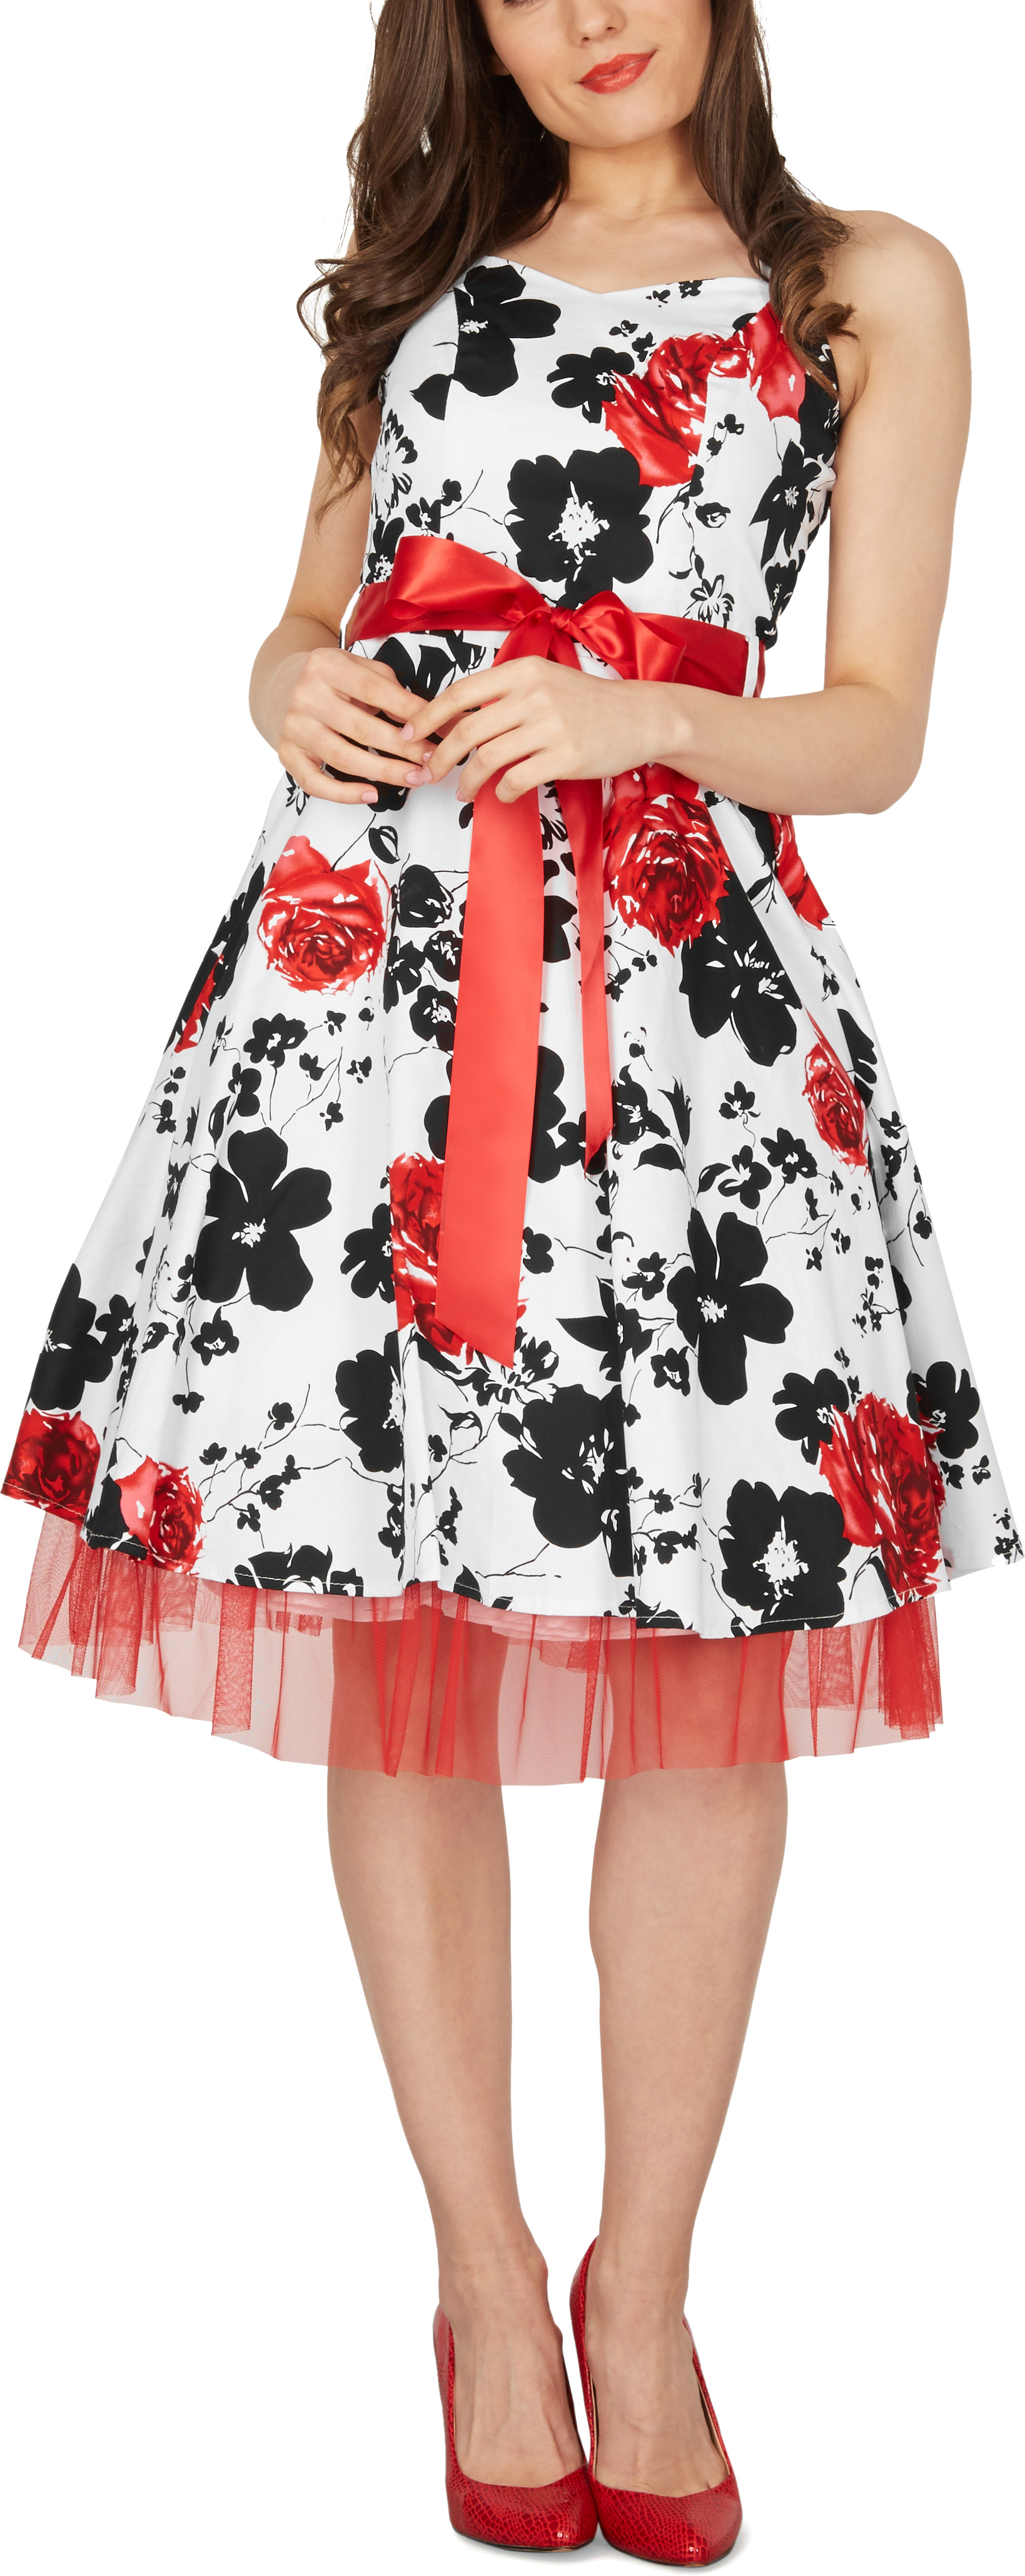 BlackButterfly /'Rhya/' Vintage Serenity 50/'s Rockabilly Bridesmaid Evening Dress